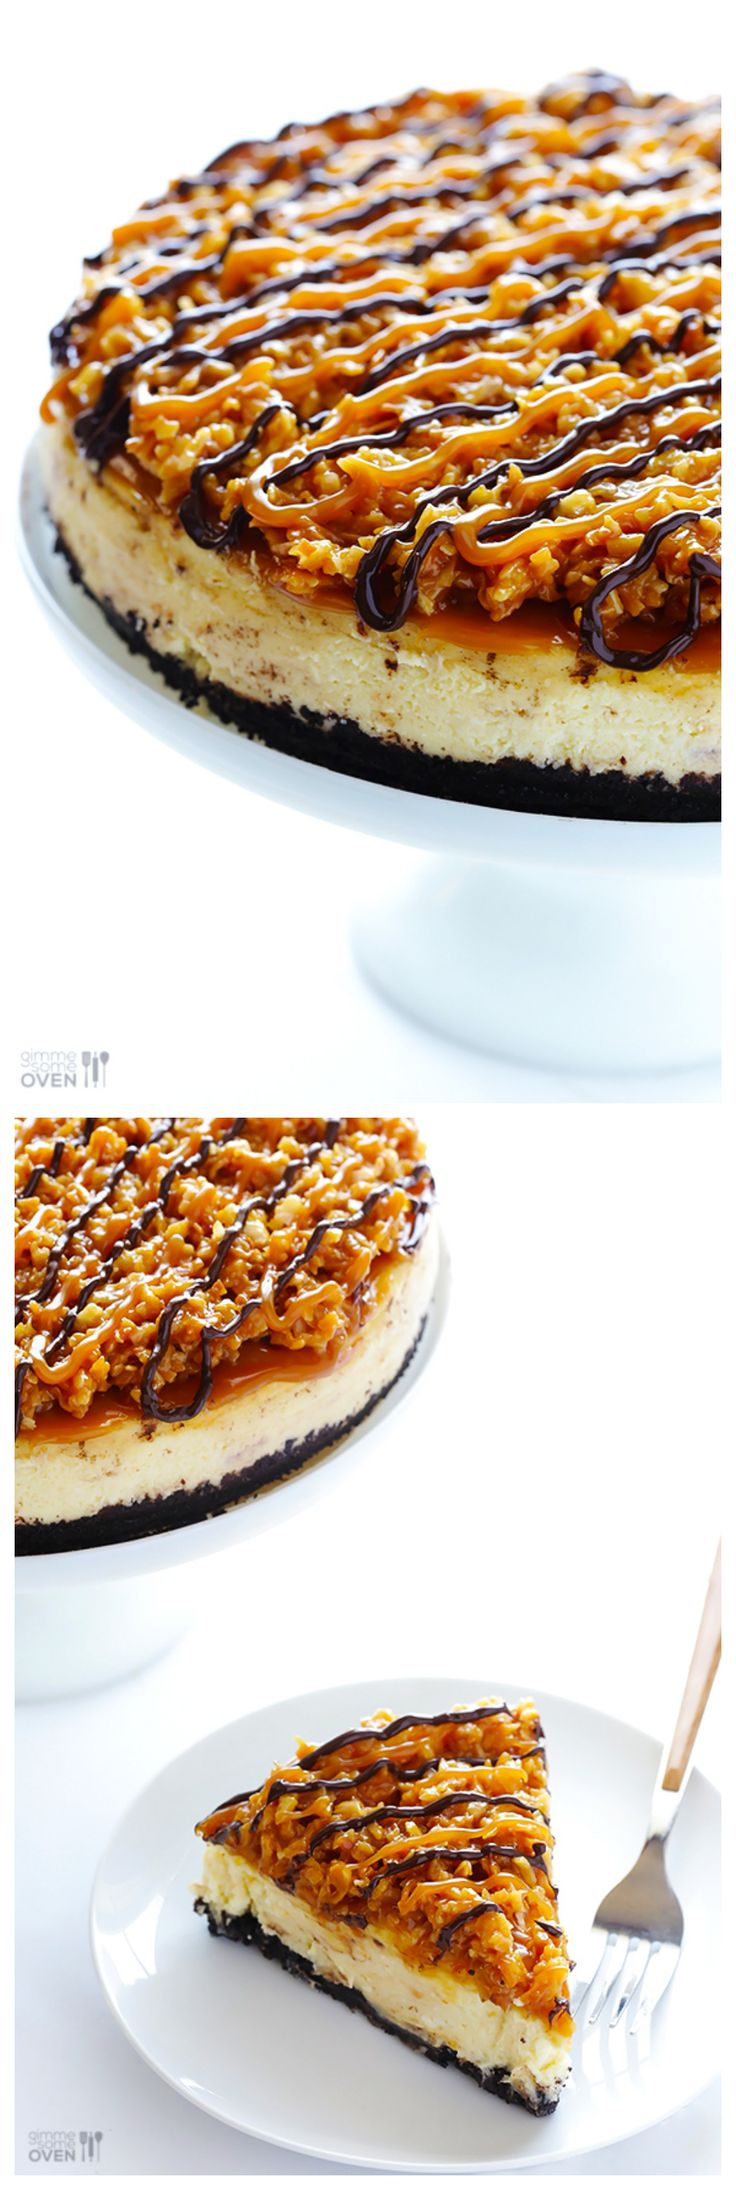 Samoa Cheesecake (Caramel DeLite Cheesecake) | gimmesomeoven.com #dessert